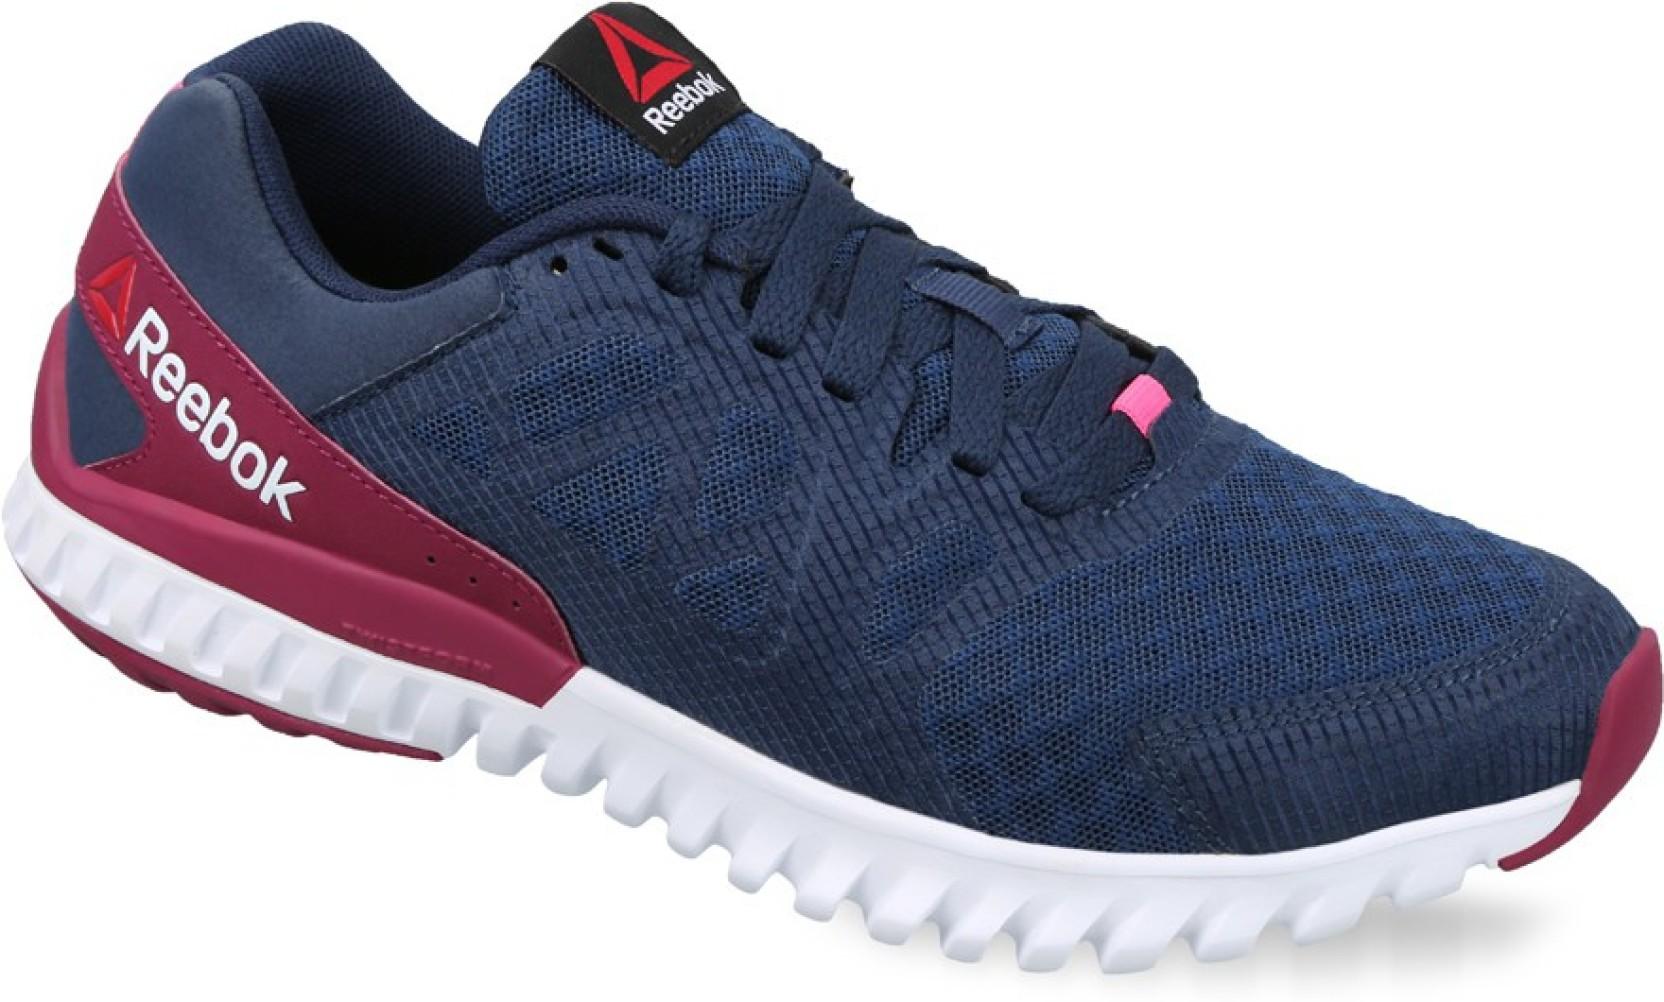 e7fc1bf9d5da REEBOK TWISTFORM BLAZE 2.0 MTM Running Shoes For Women - Buy NAVY ...